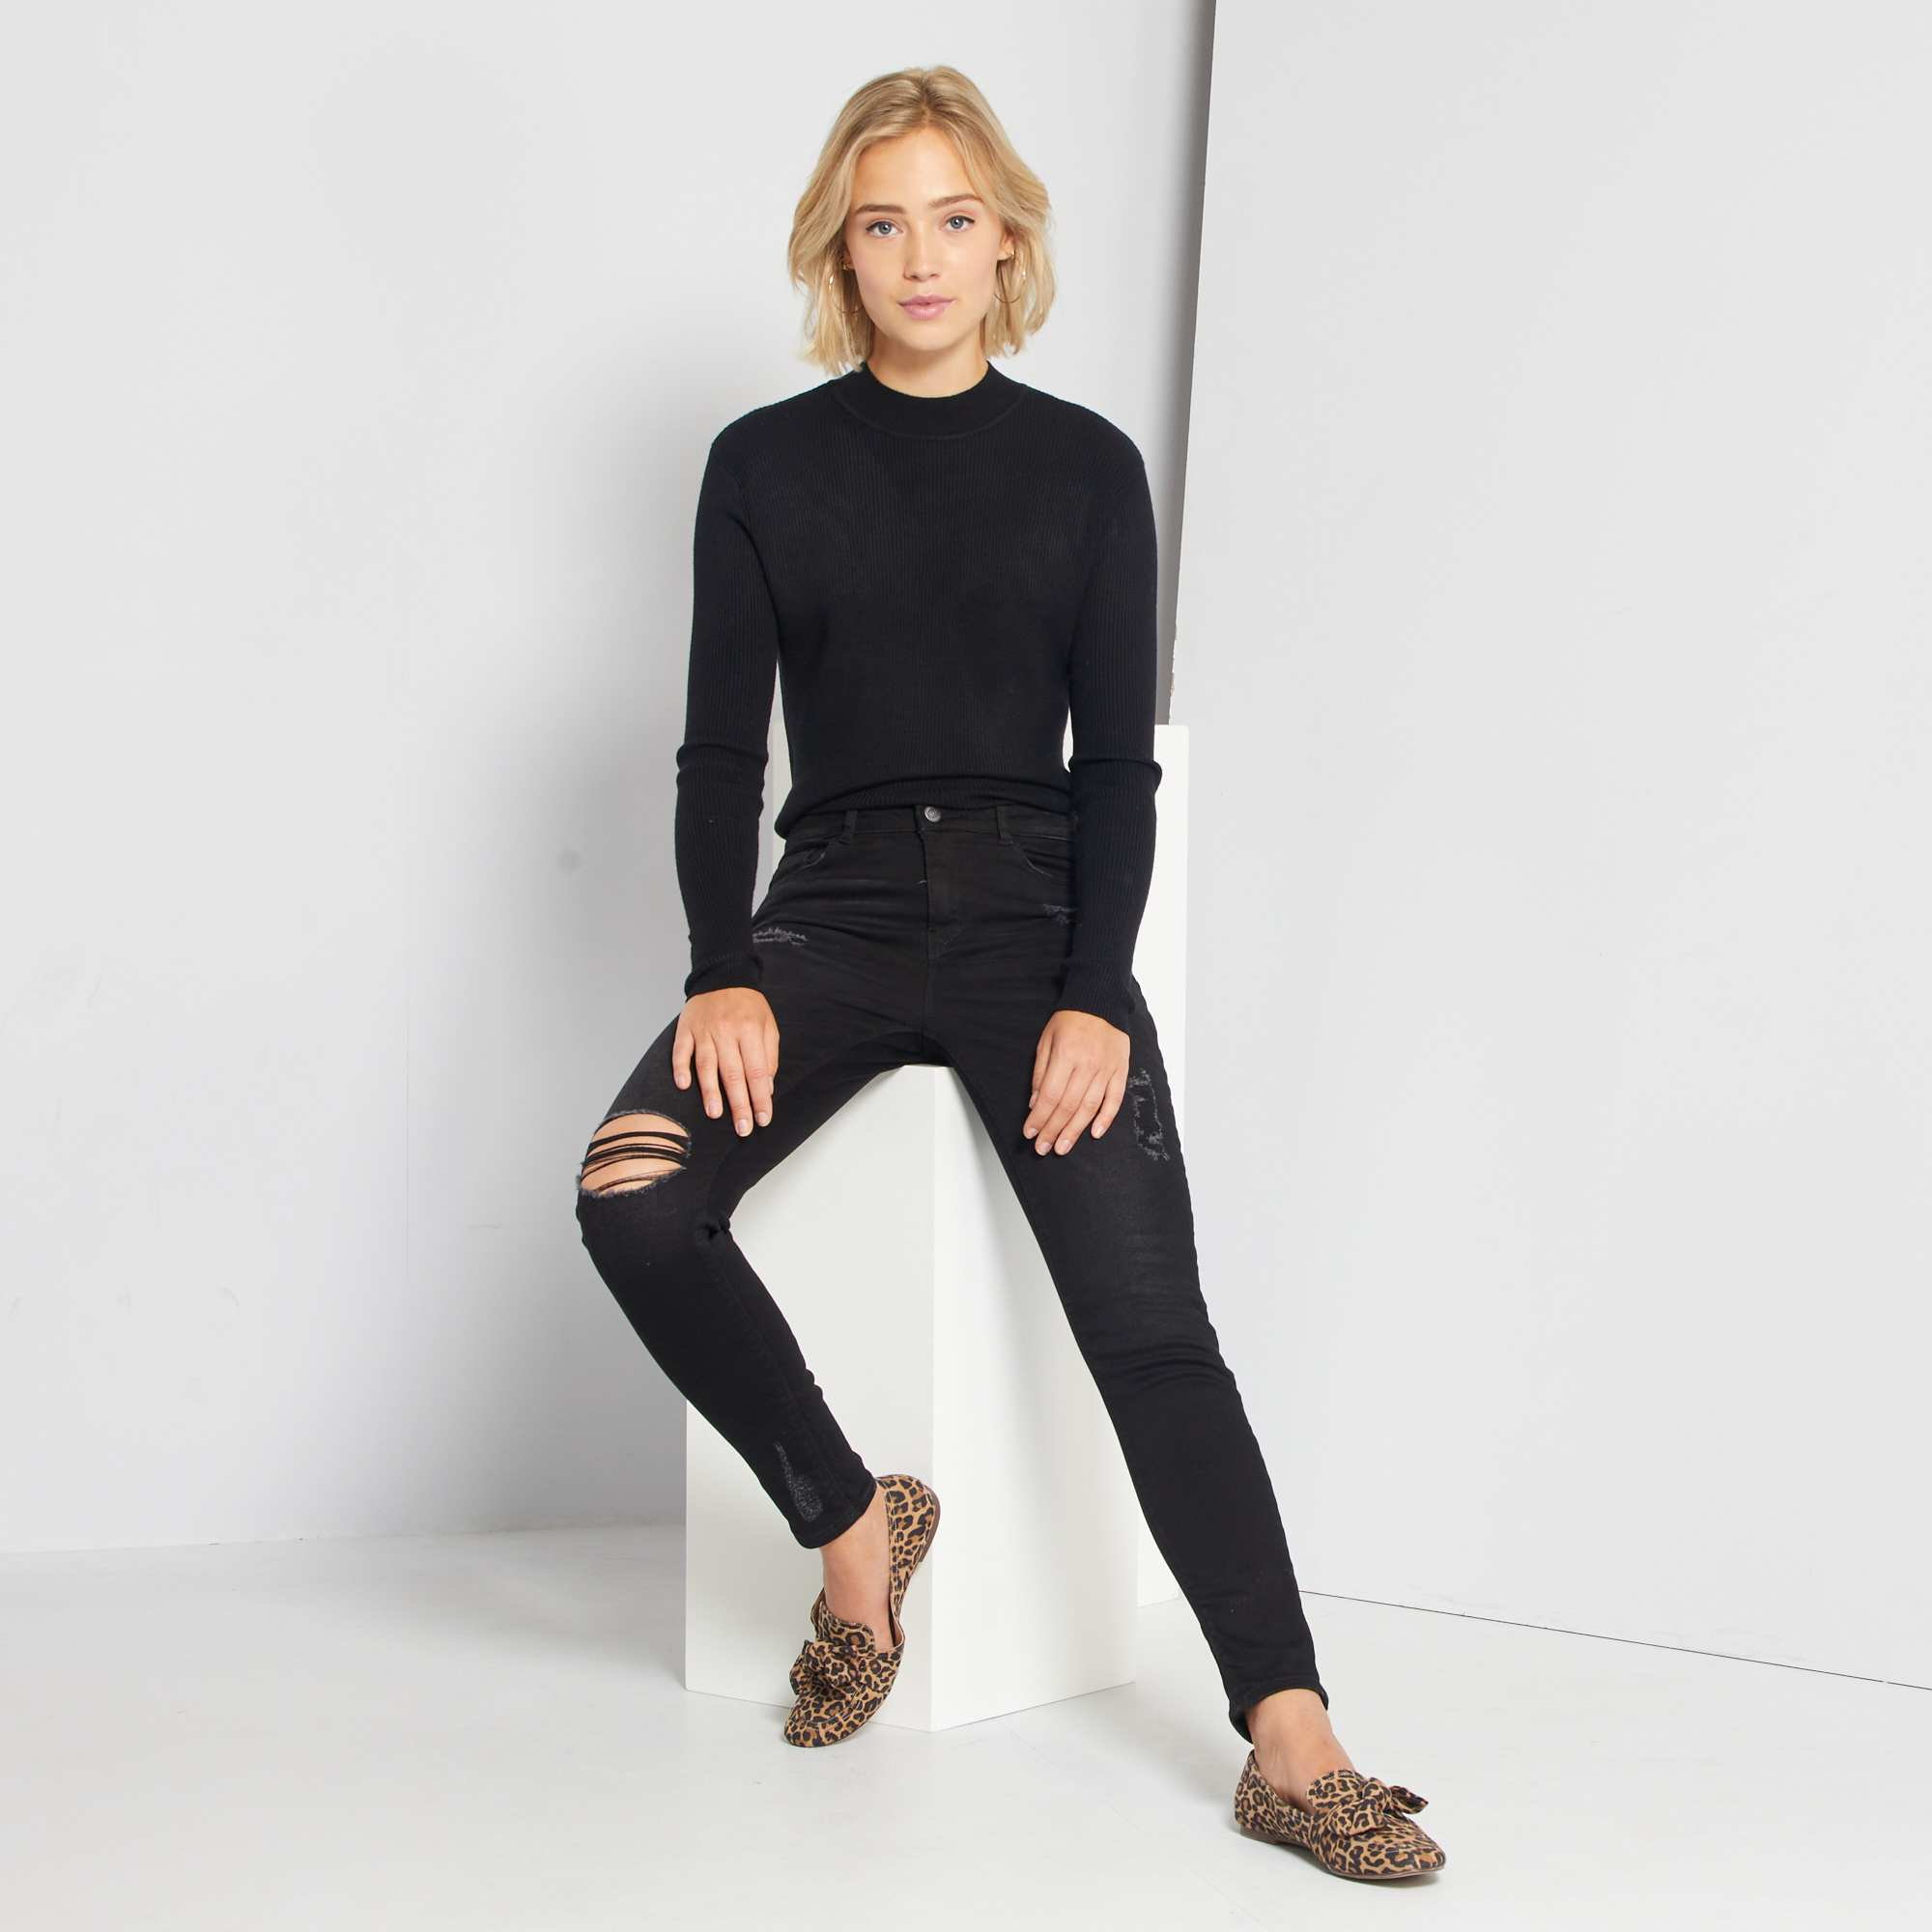 jean skinny abrasions taille tr s haute femme noir. Black Bedroom Furniture Sets. Home Design Ideas